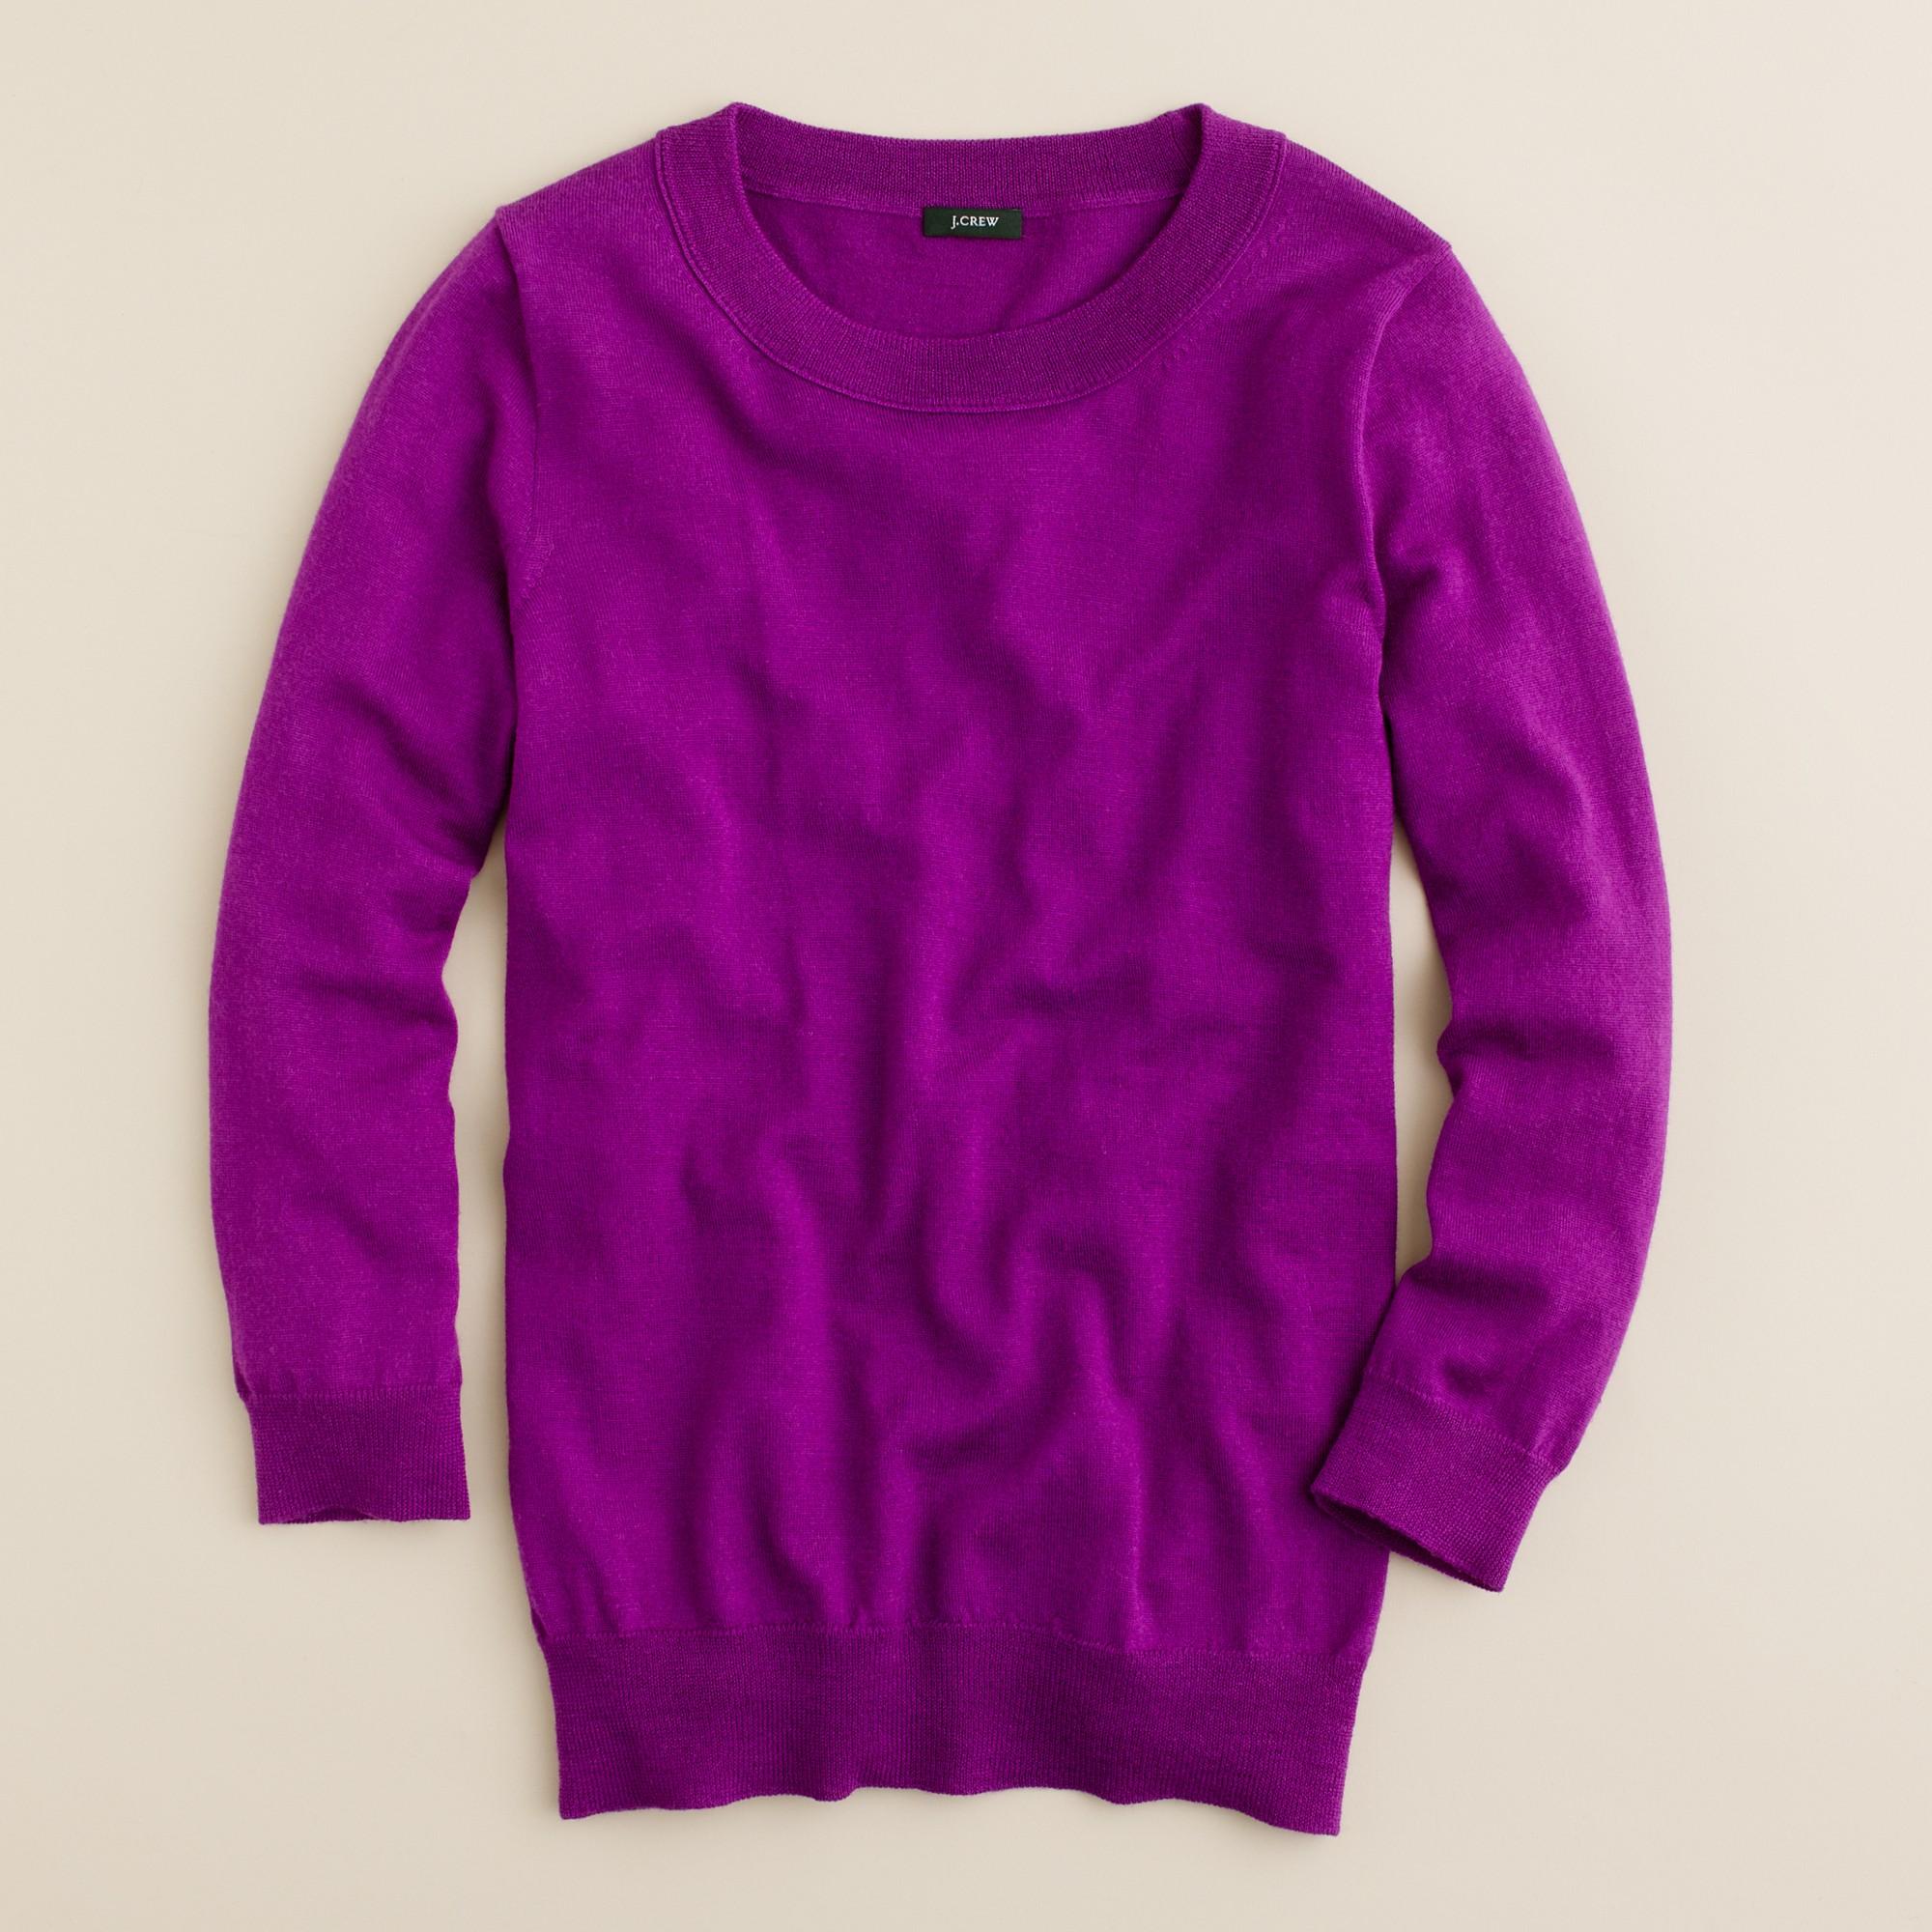 J.crew Tippi Sweater in Purple | Lyst